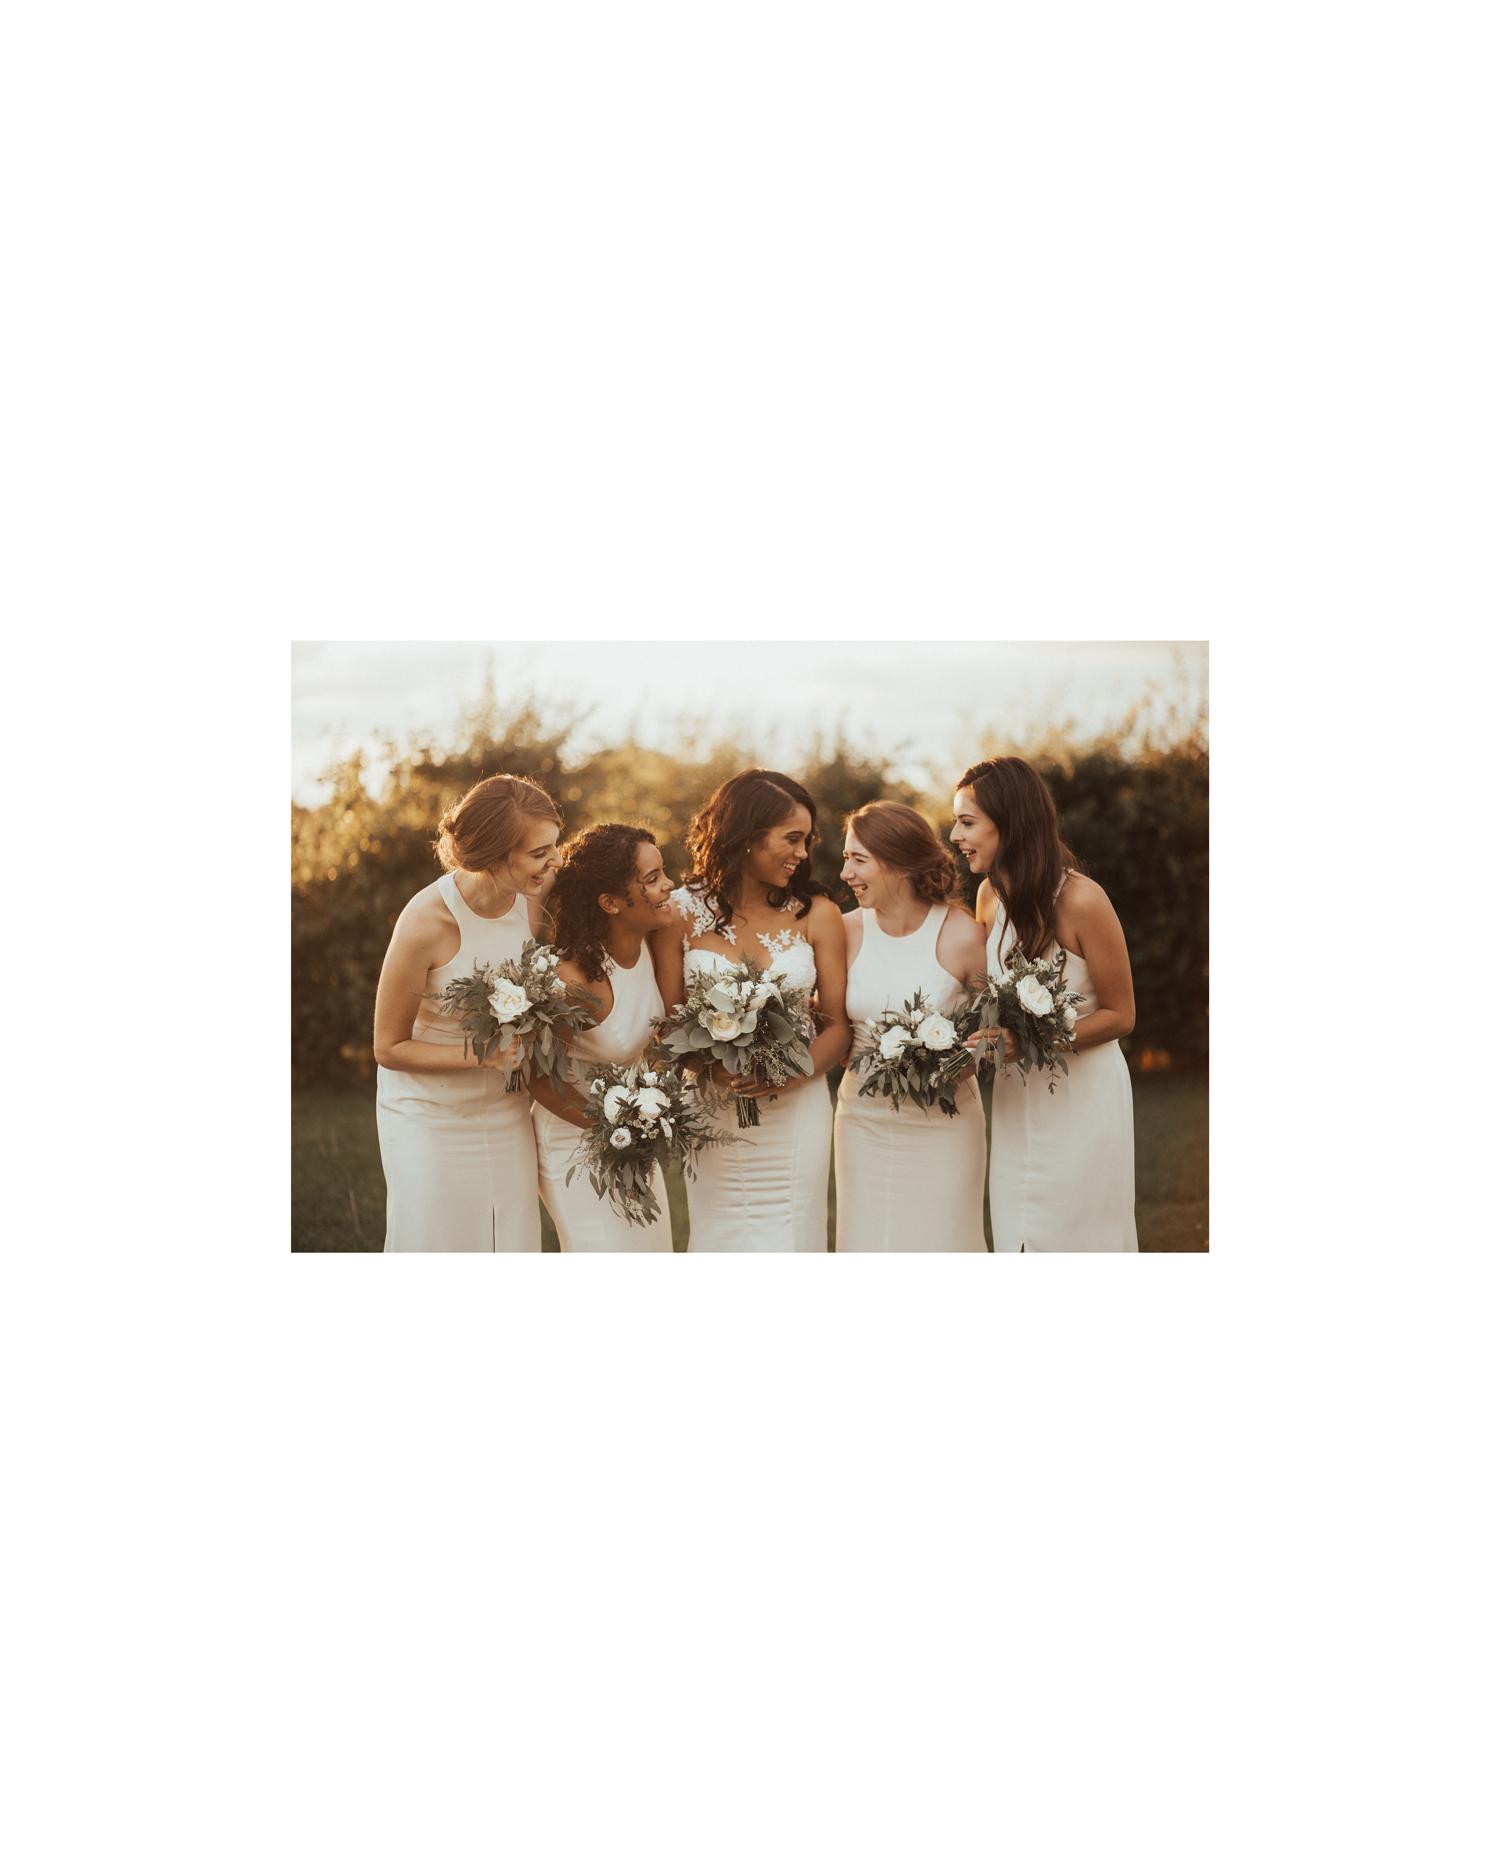 white bridesmaid dresses nataly j photography